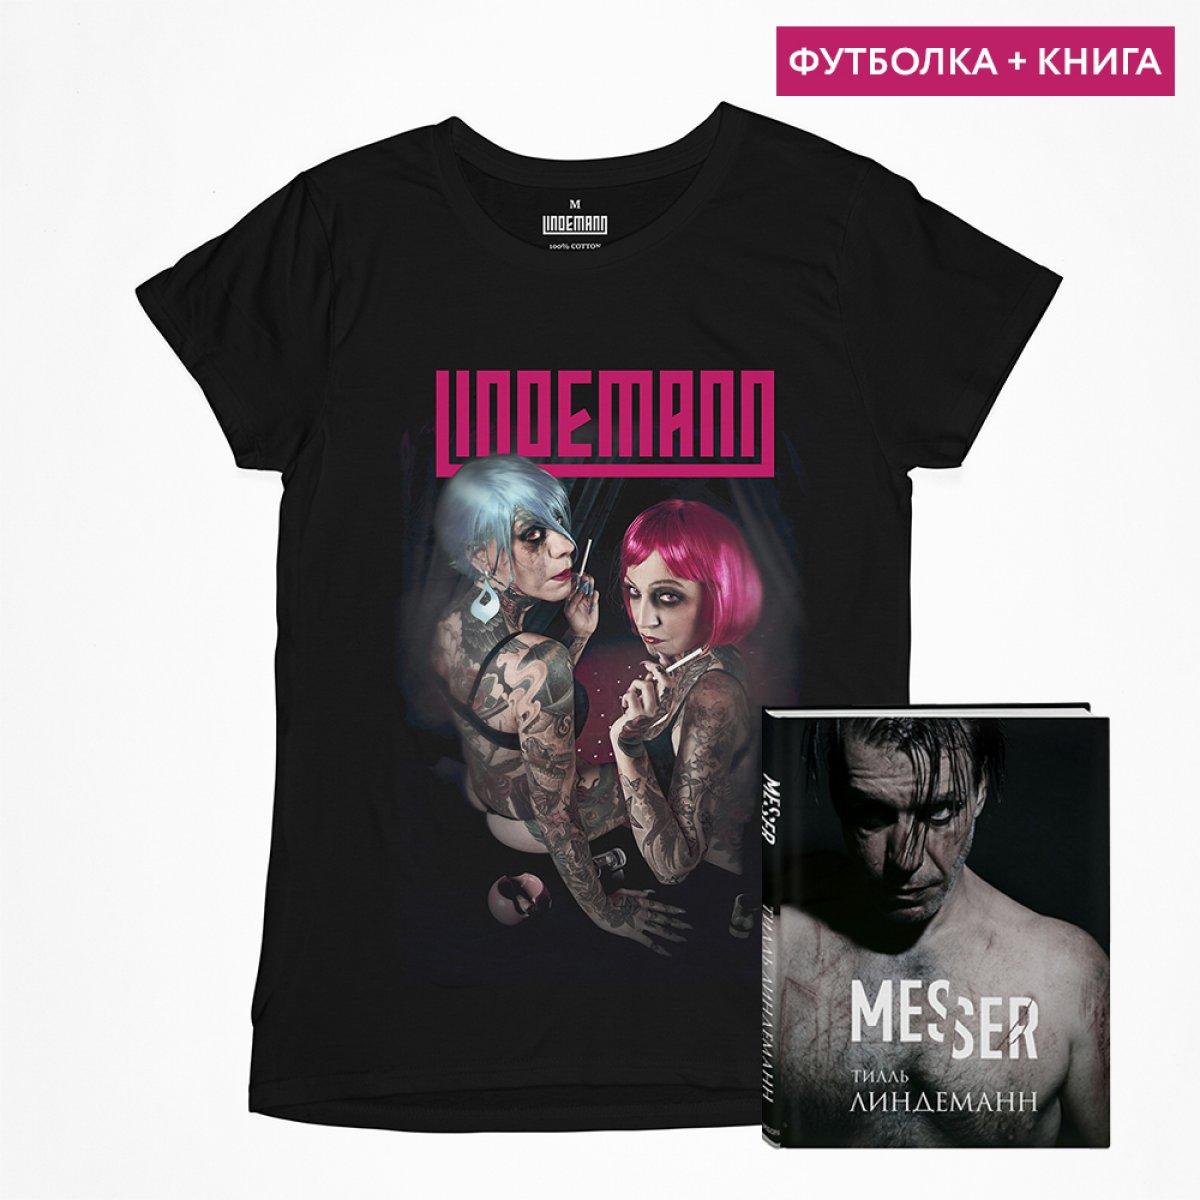 Комплект Книга «Тилль Линдеманн. Messer» + футболка «Lindemann Ladyboy»